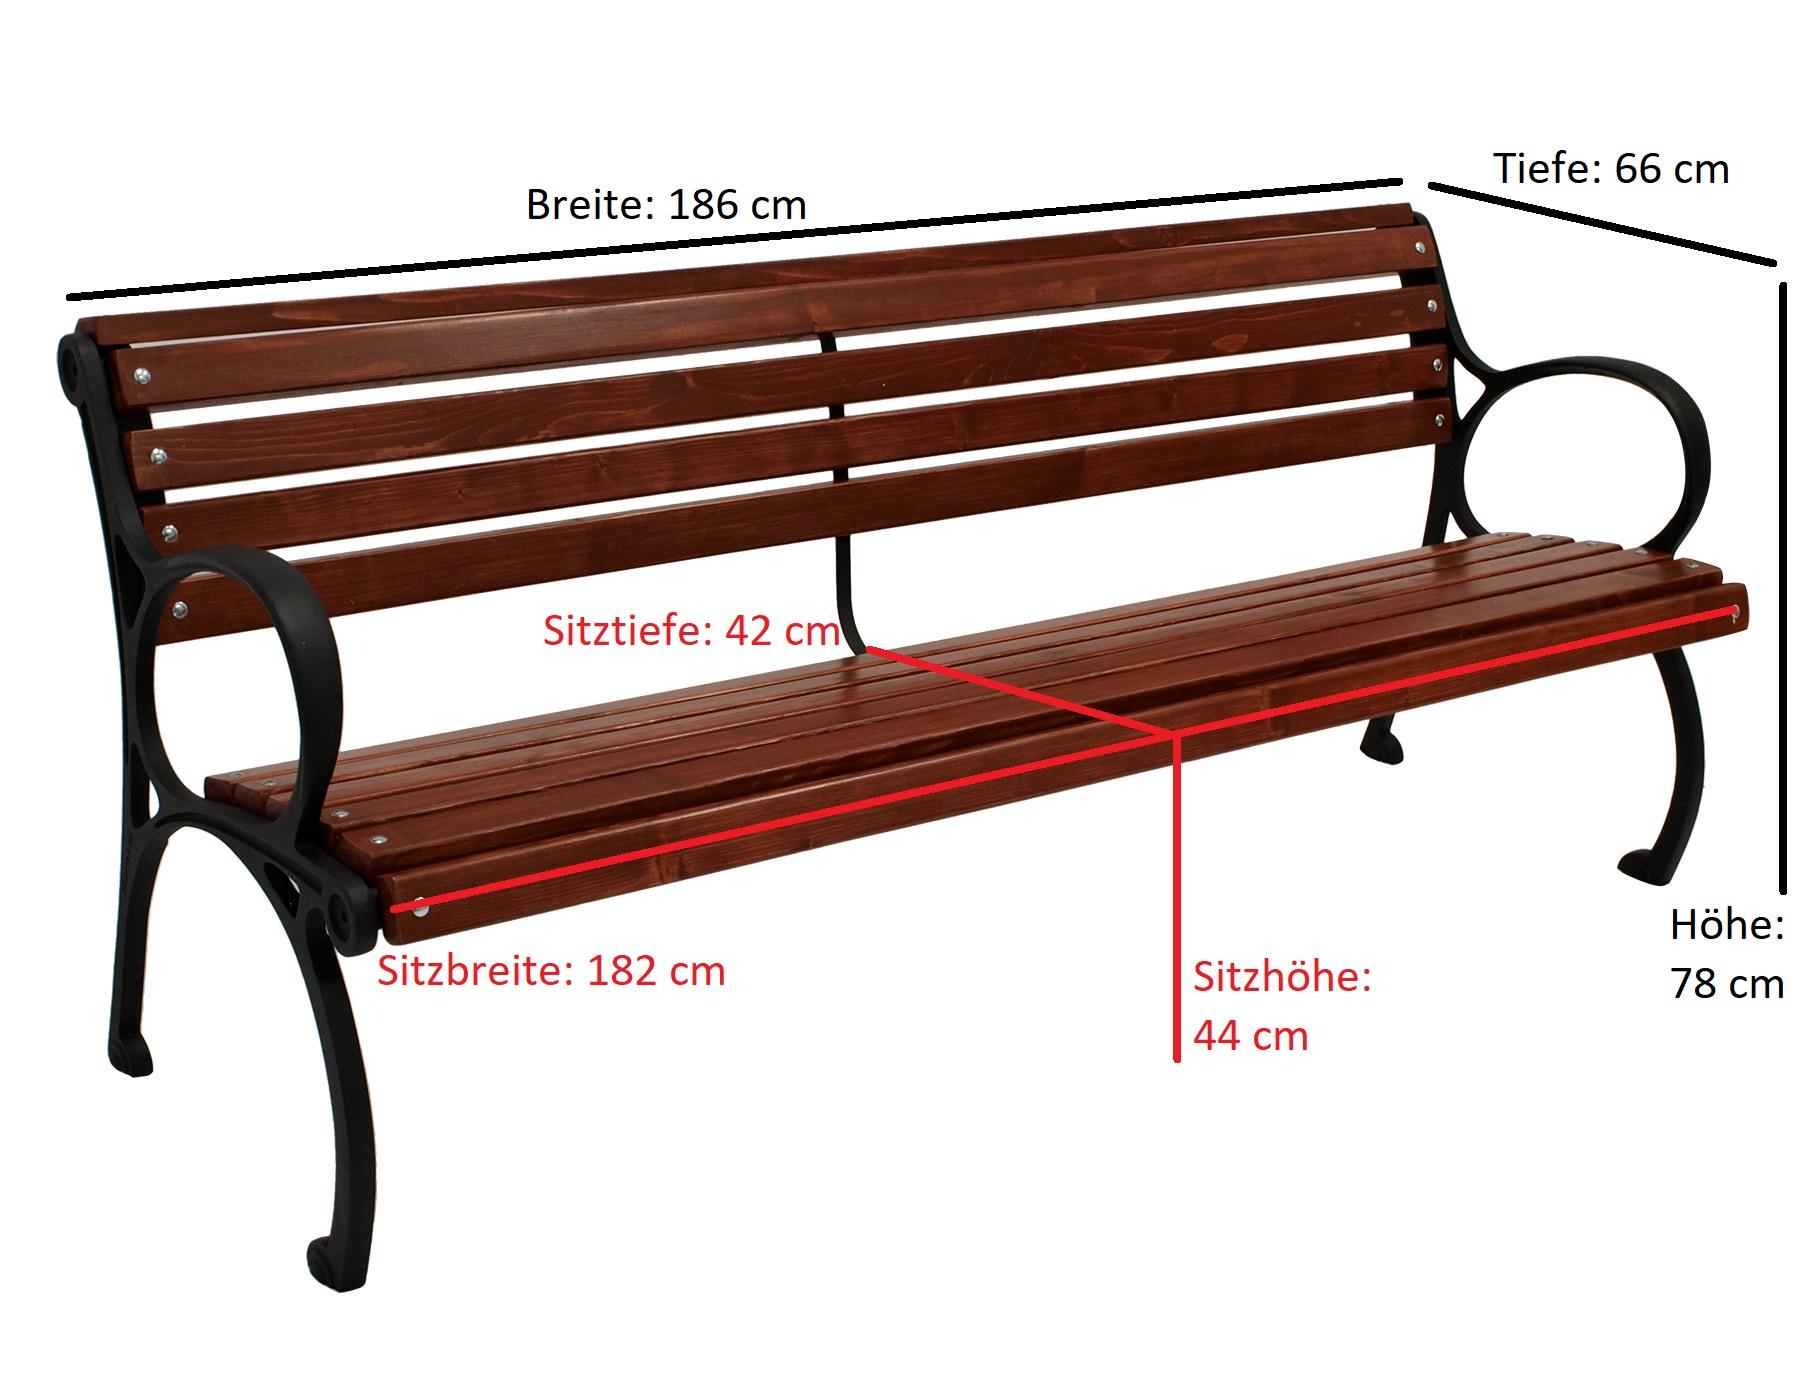 Bank COLMAR 4-sitzer 186cm, Gusseisen schwarz, Kiefernholz mahagonifarben